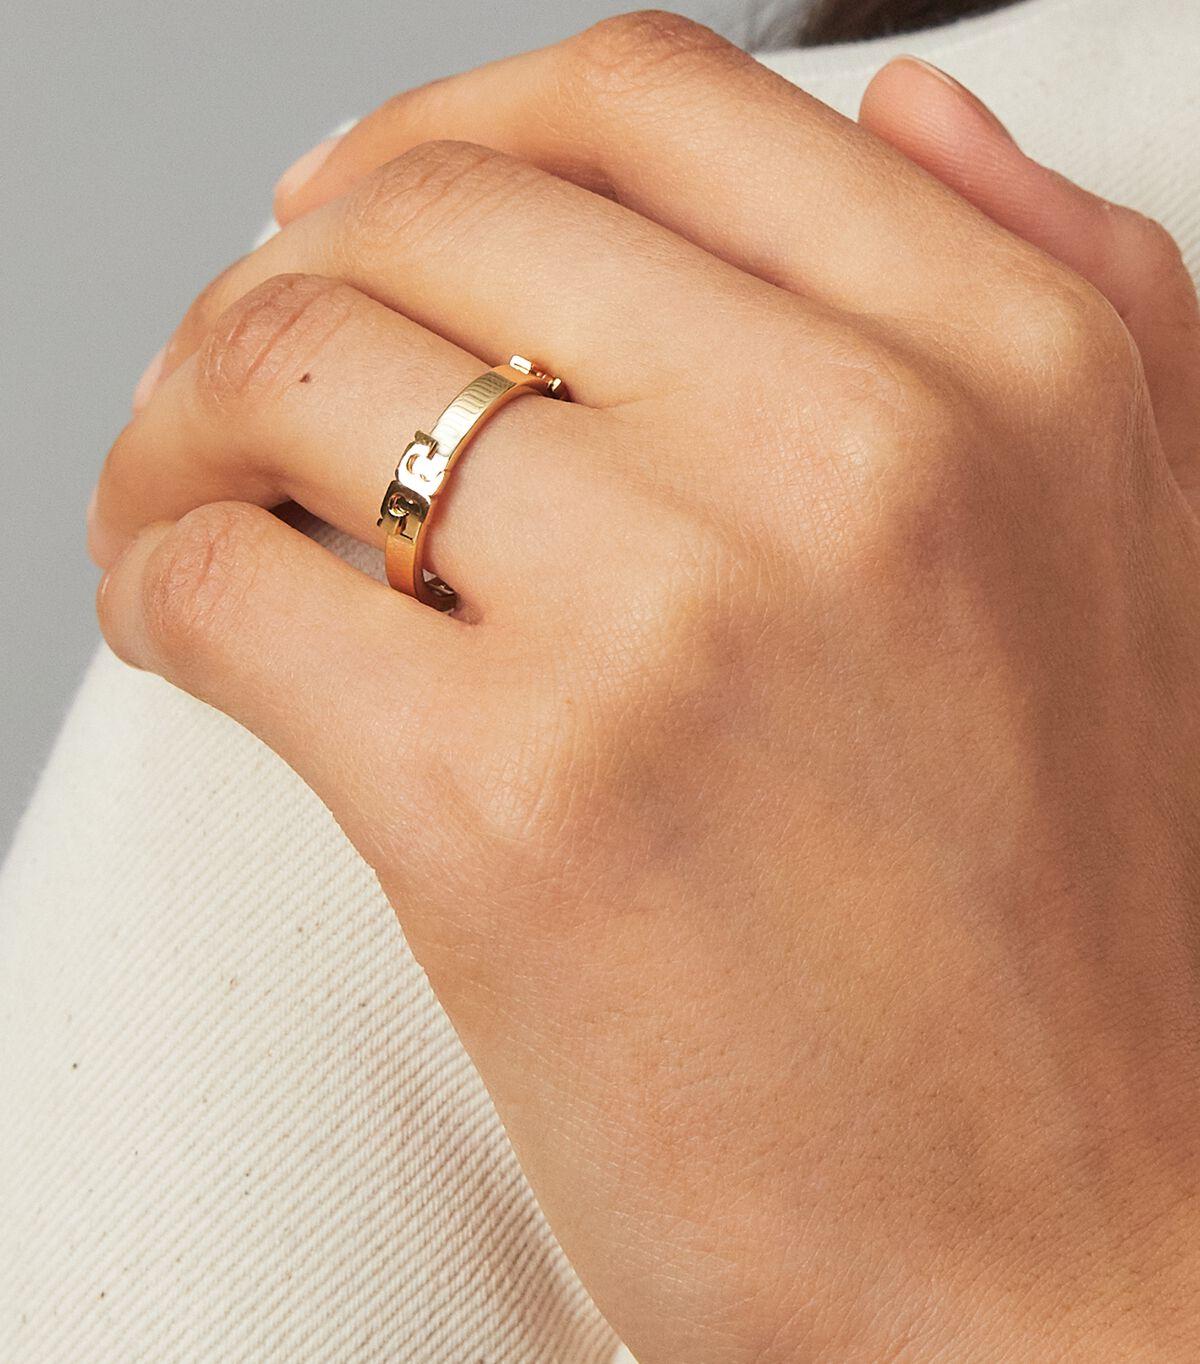 خاتم Serif-T معدني قابل للتكديس